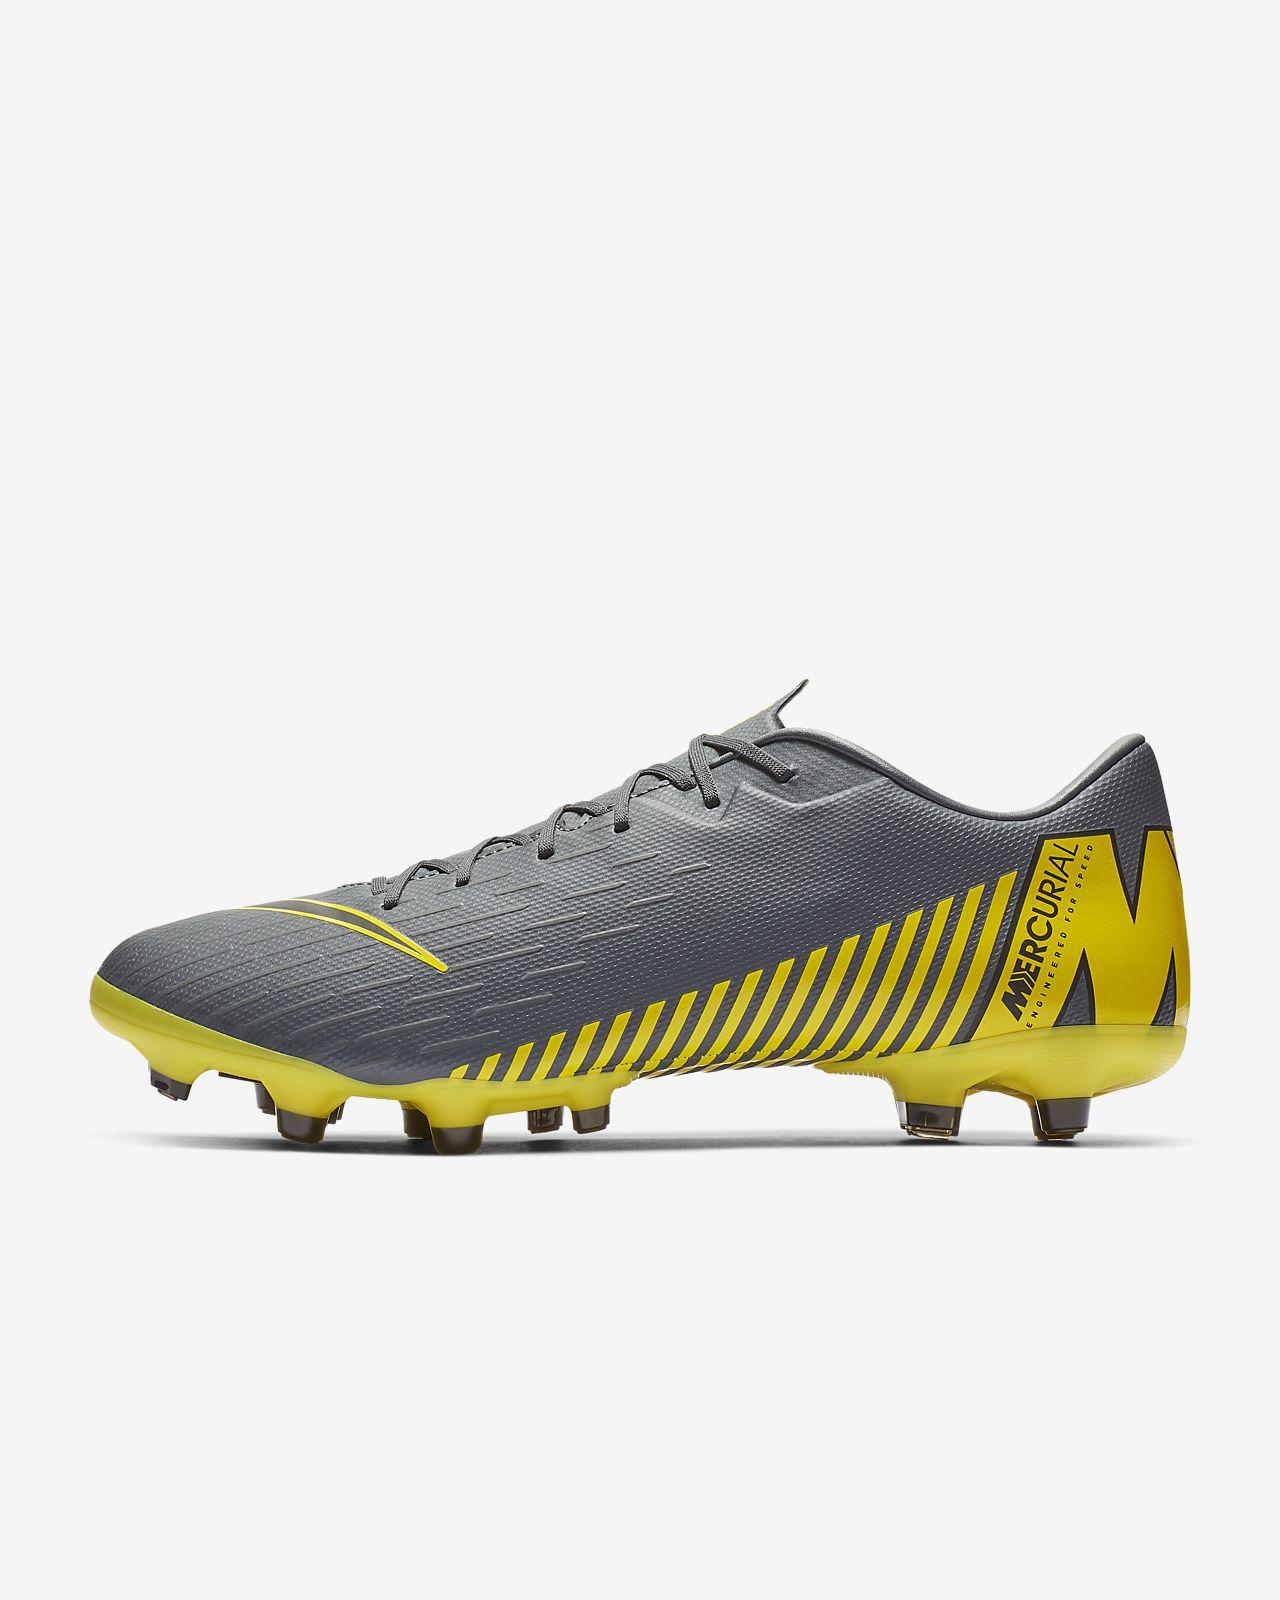 b655934e4bbe5 Nike Vapor 12 Academy MG Multi-Ground Football Boot